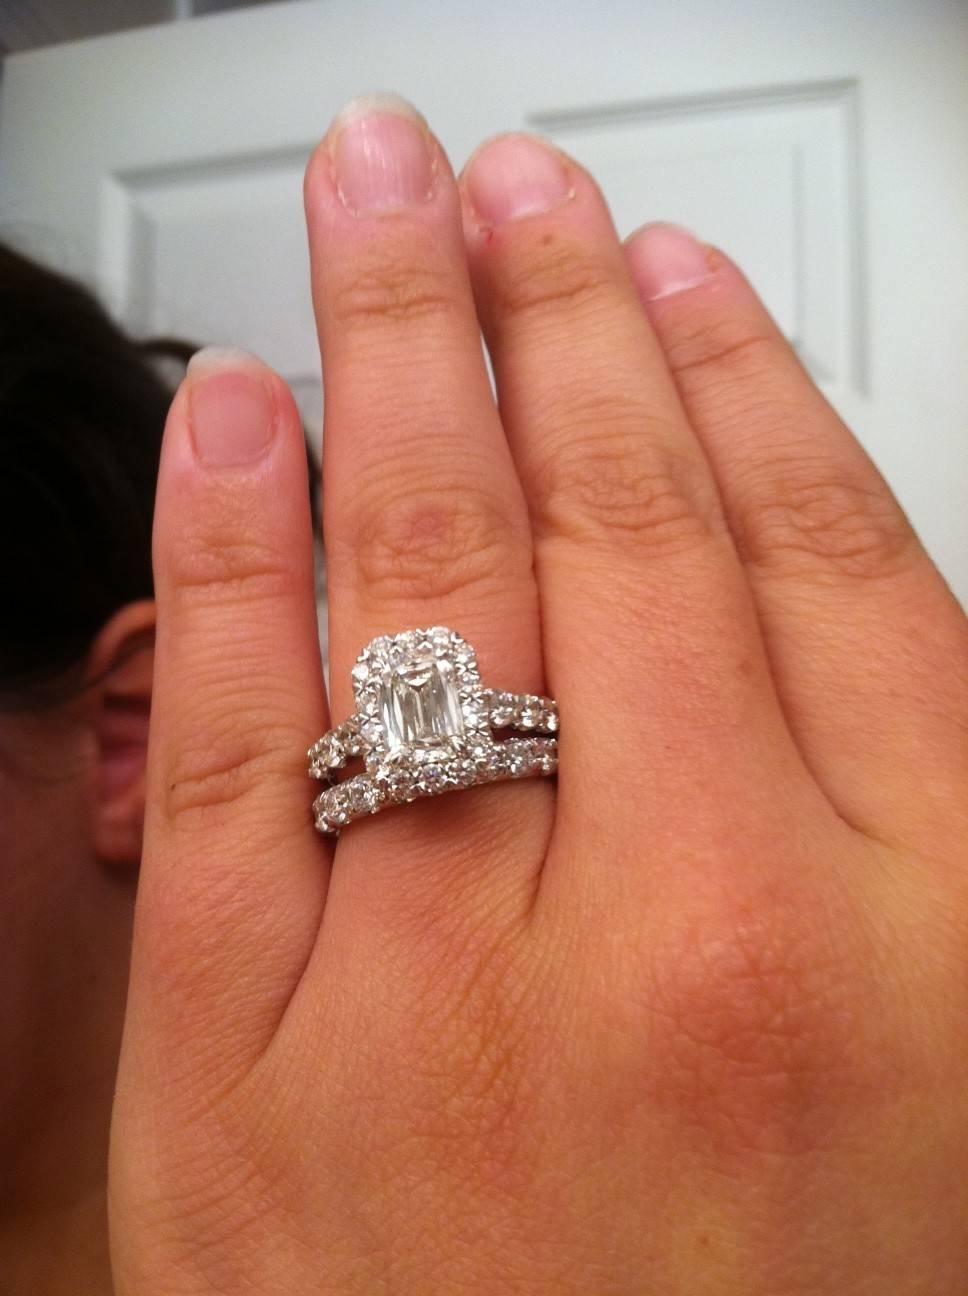 Download 2 Carat Wedding Ring | Wedding Corners In 2 Ct Wedding Rings (View 5 of 15)